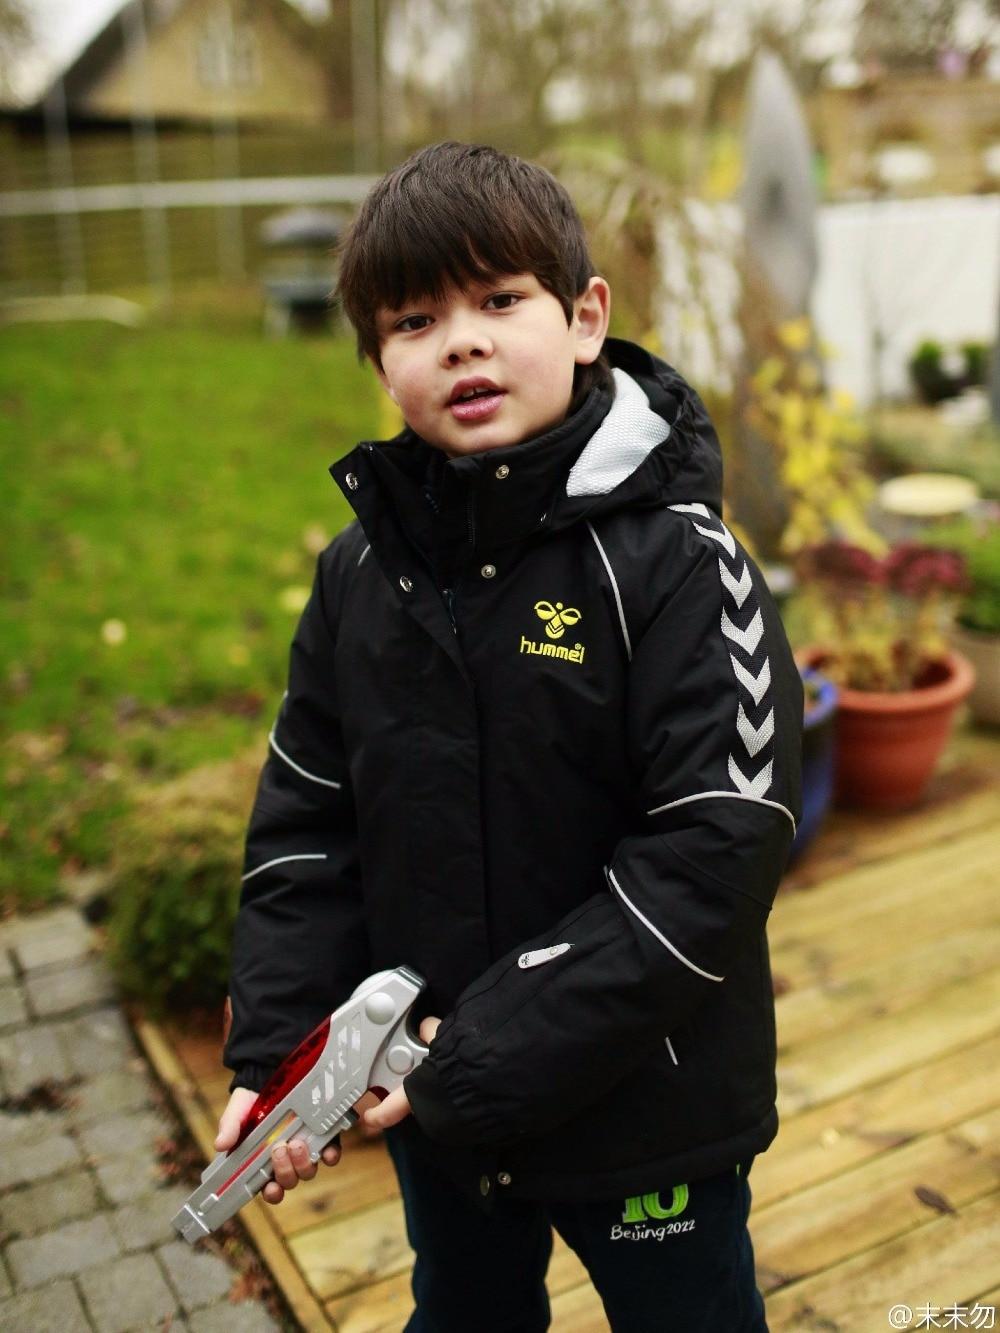 children/kids boys winter windproof padded jacket, hooded jacket, ski jacket, high quality, size 116-140<br>